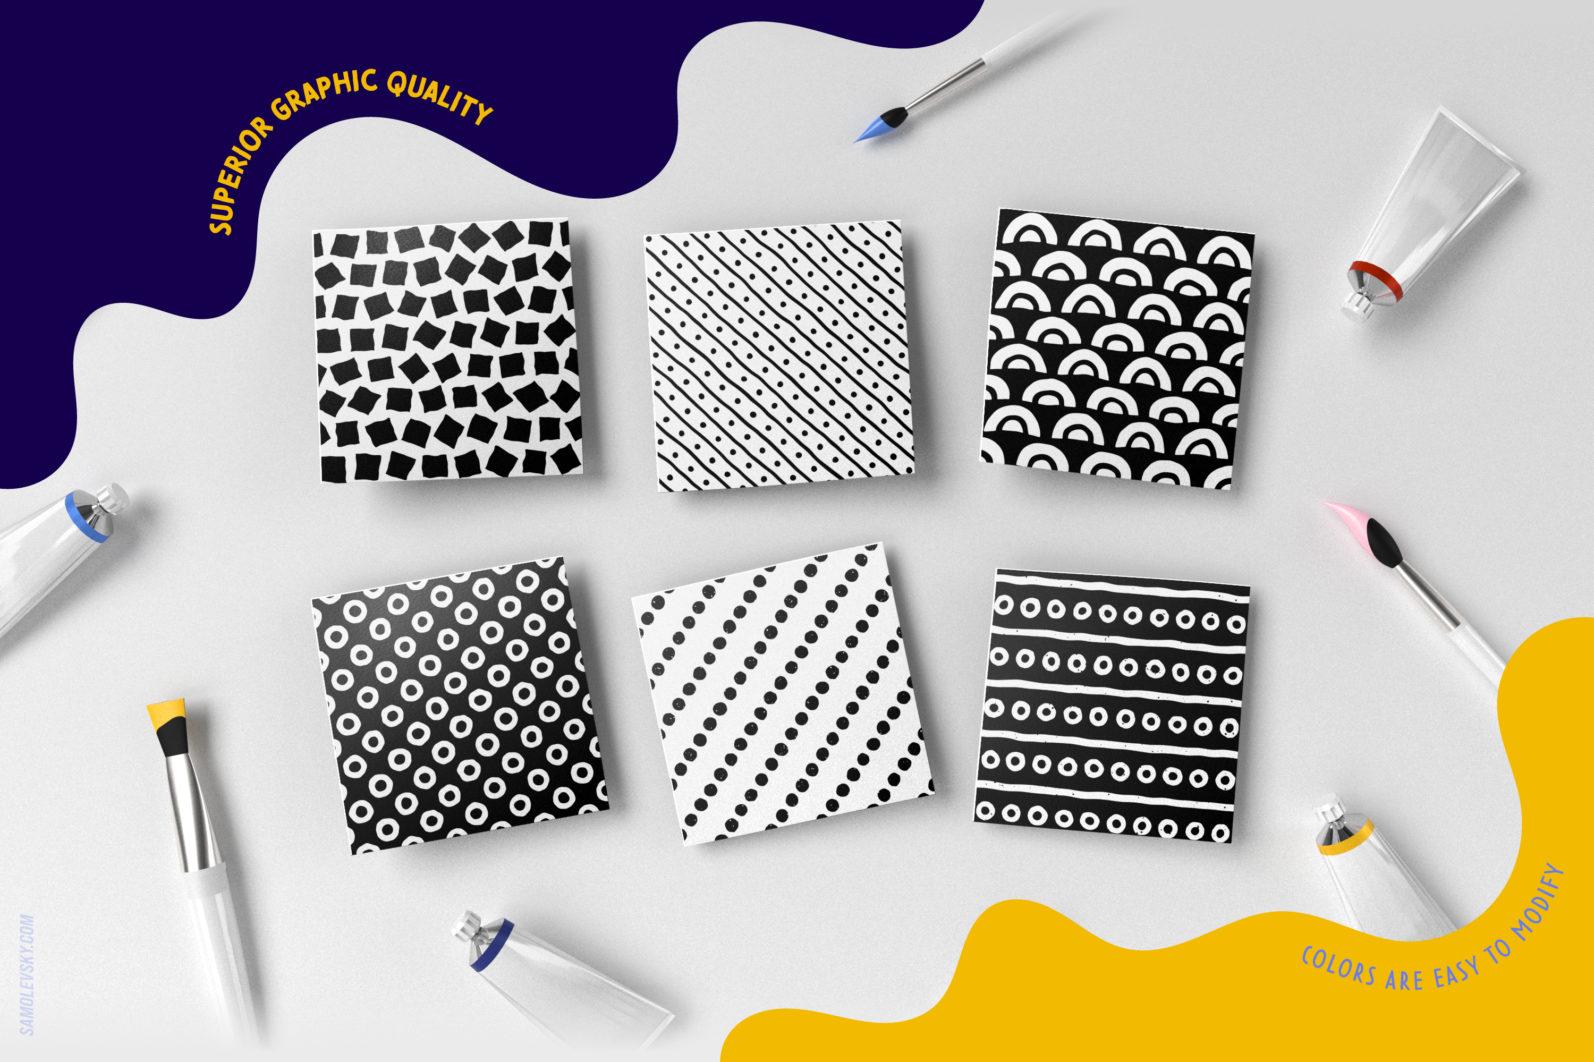 Handmade patterns bundle - 300 seamless patterns, brushes, and shapes - Samolevsky.com Handmade patterns bundle 16 scaled -